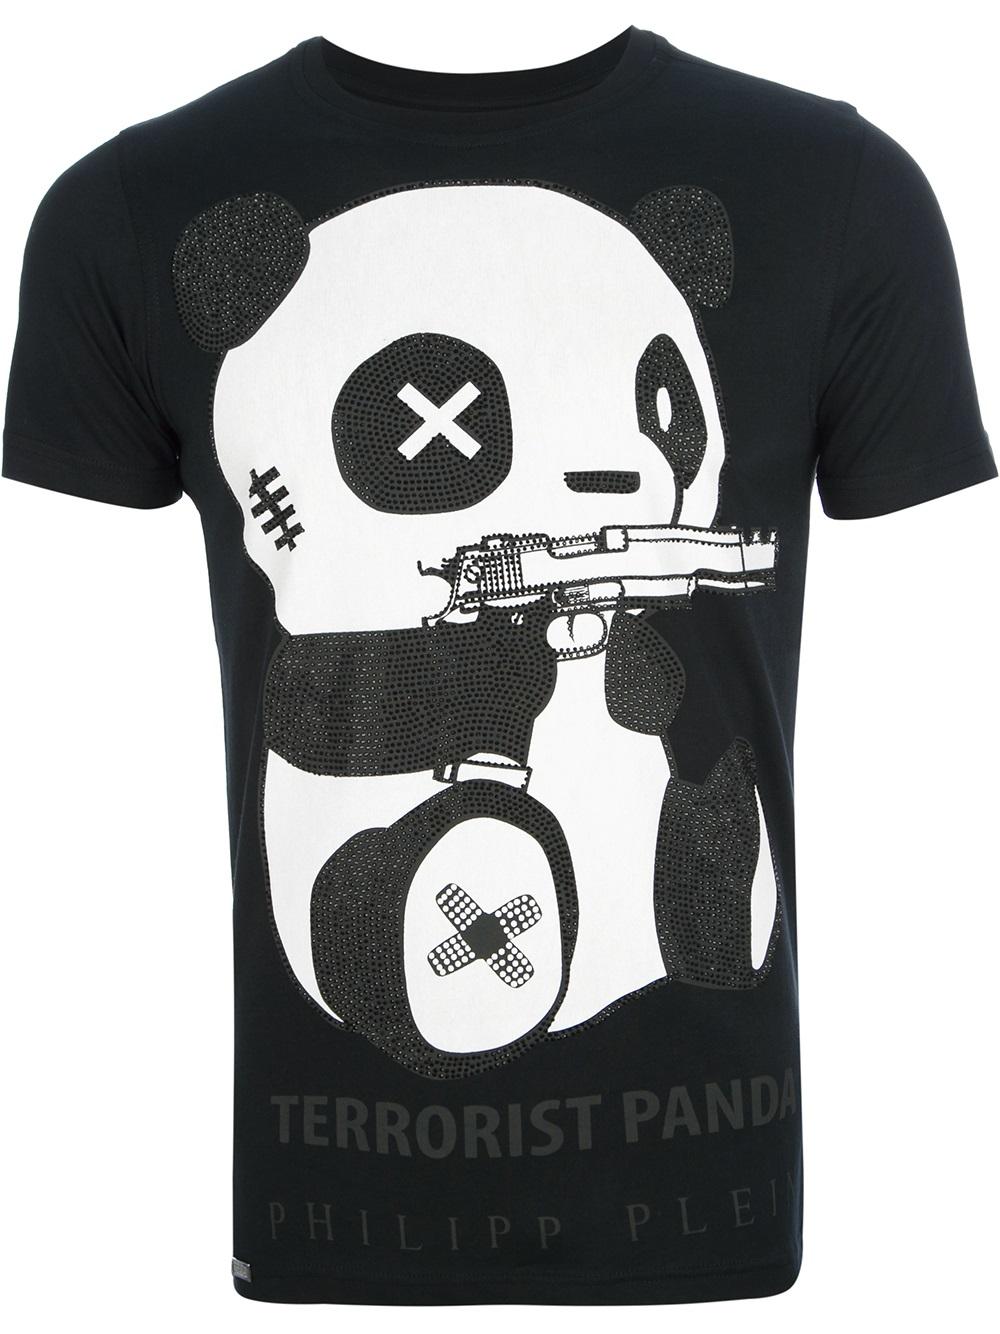 philipp plein terrorist panda tshirt in black for men lyst. Black Bedroom Furniture Sets. Home Design Ideas